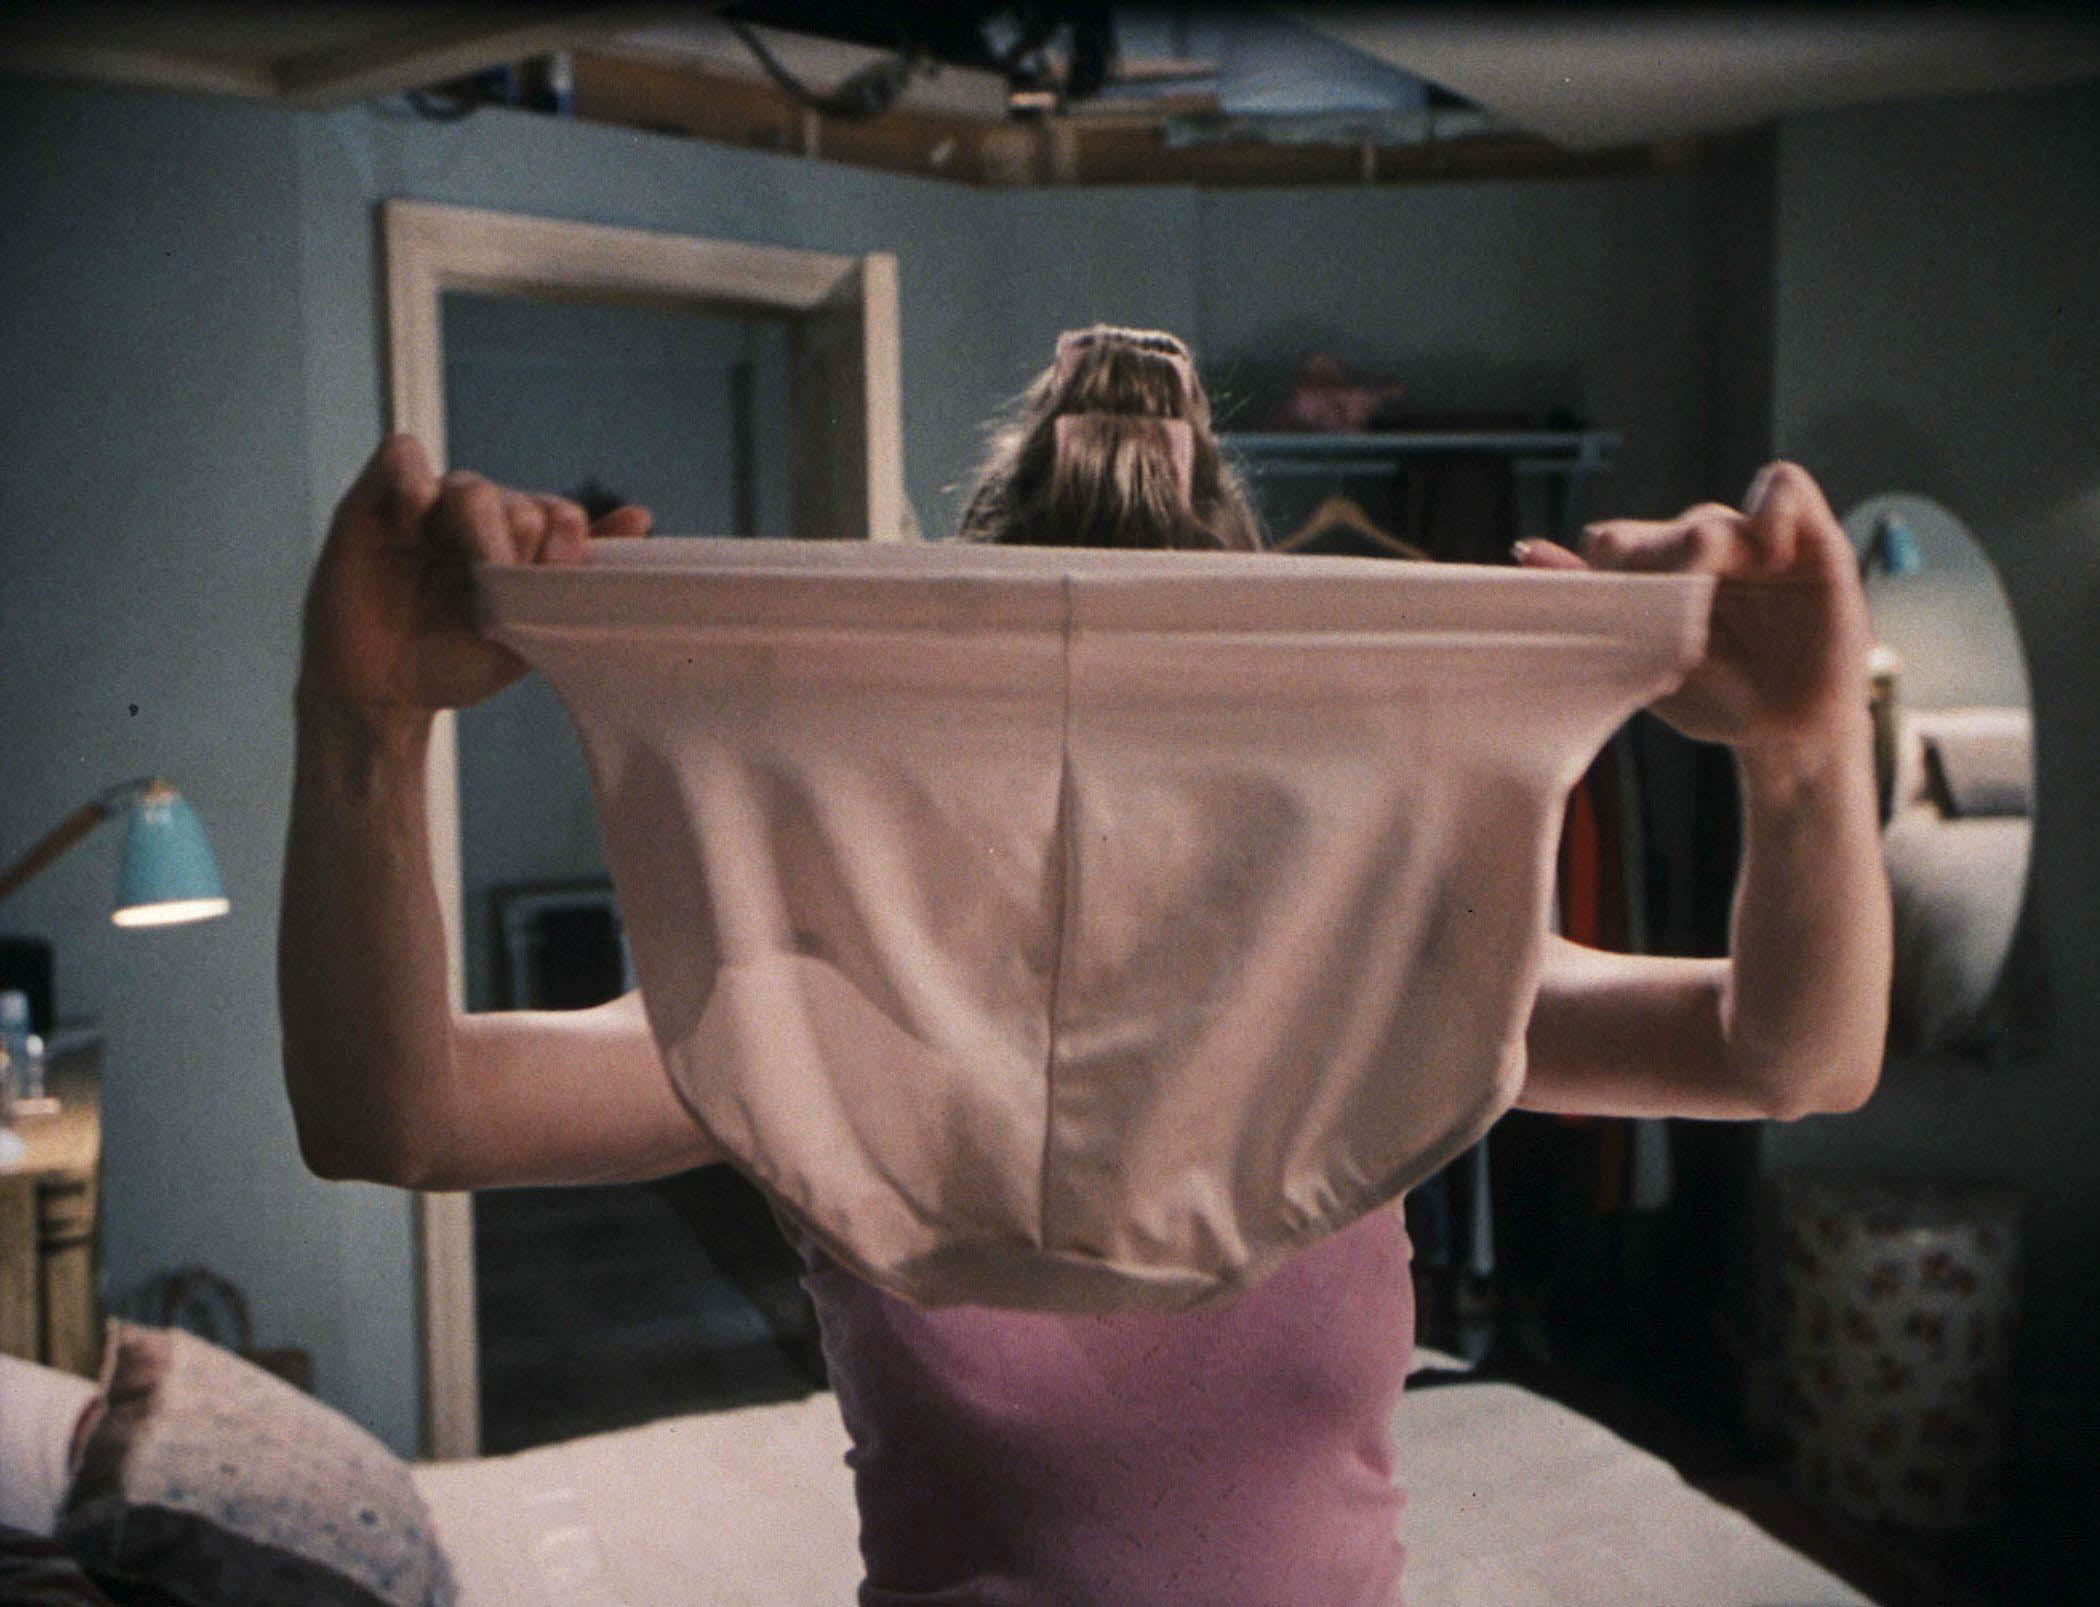 An image from Bridget Jones's Diary of her big pants